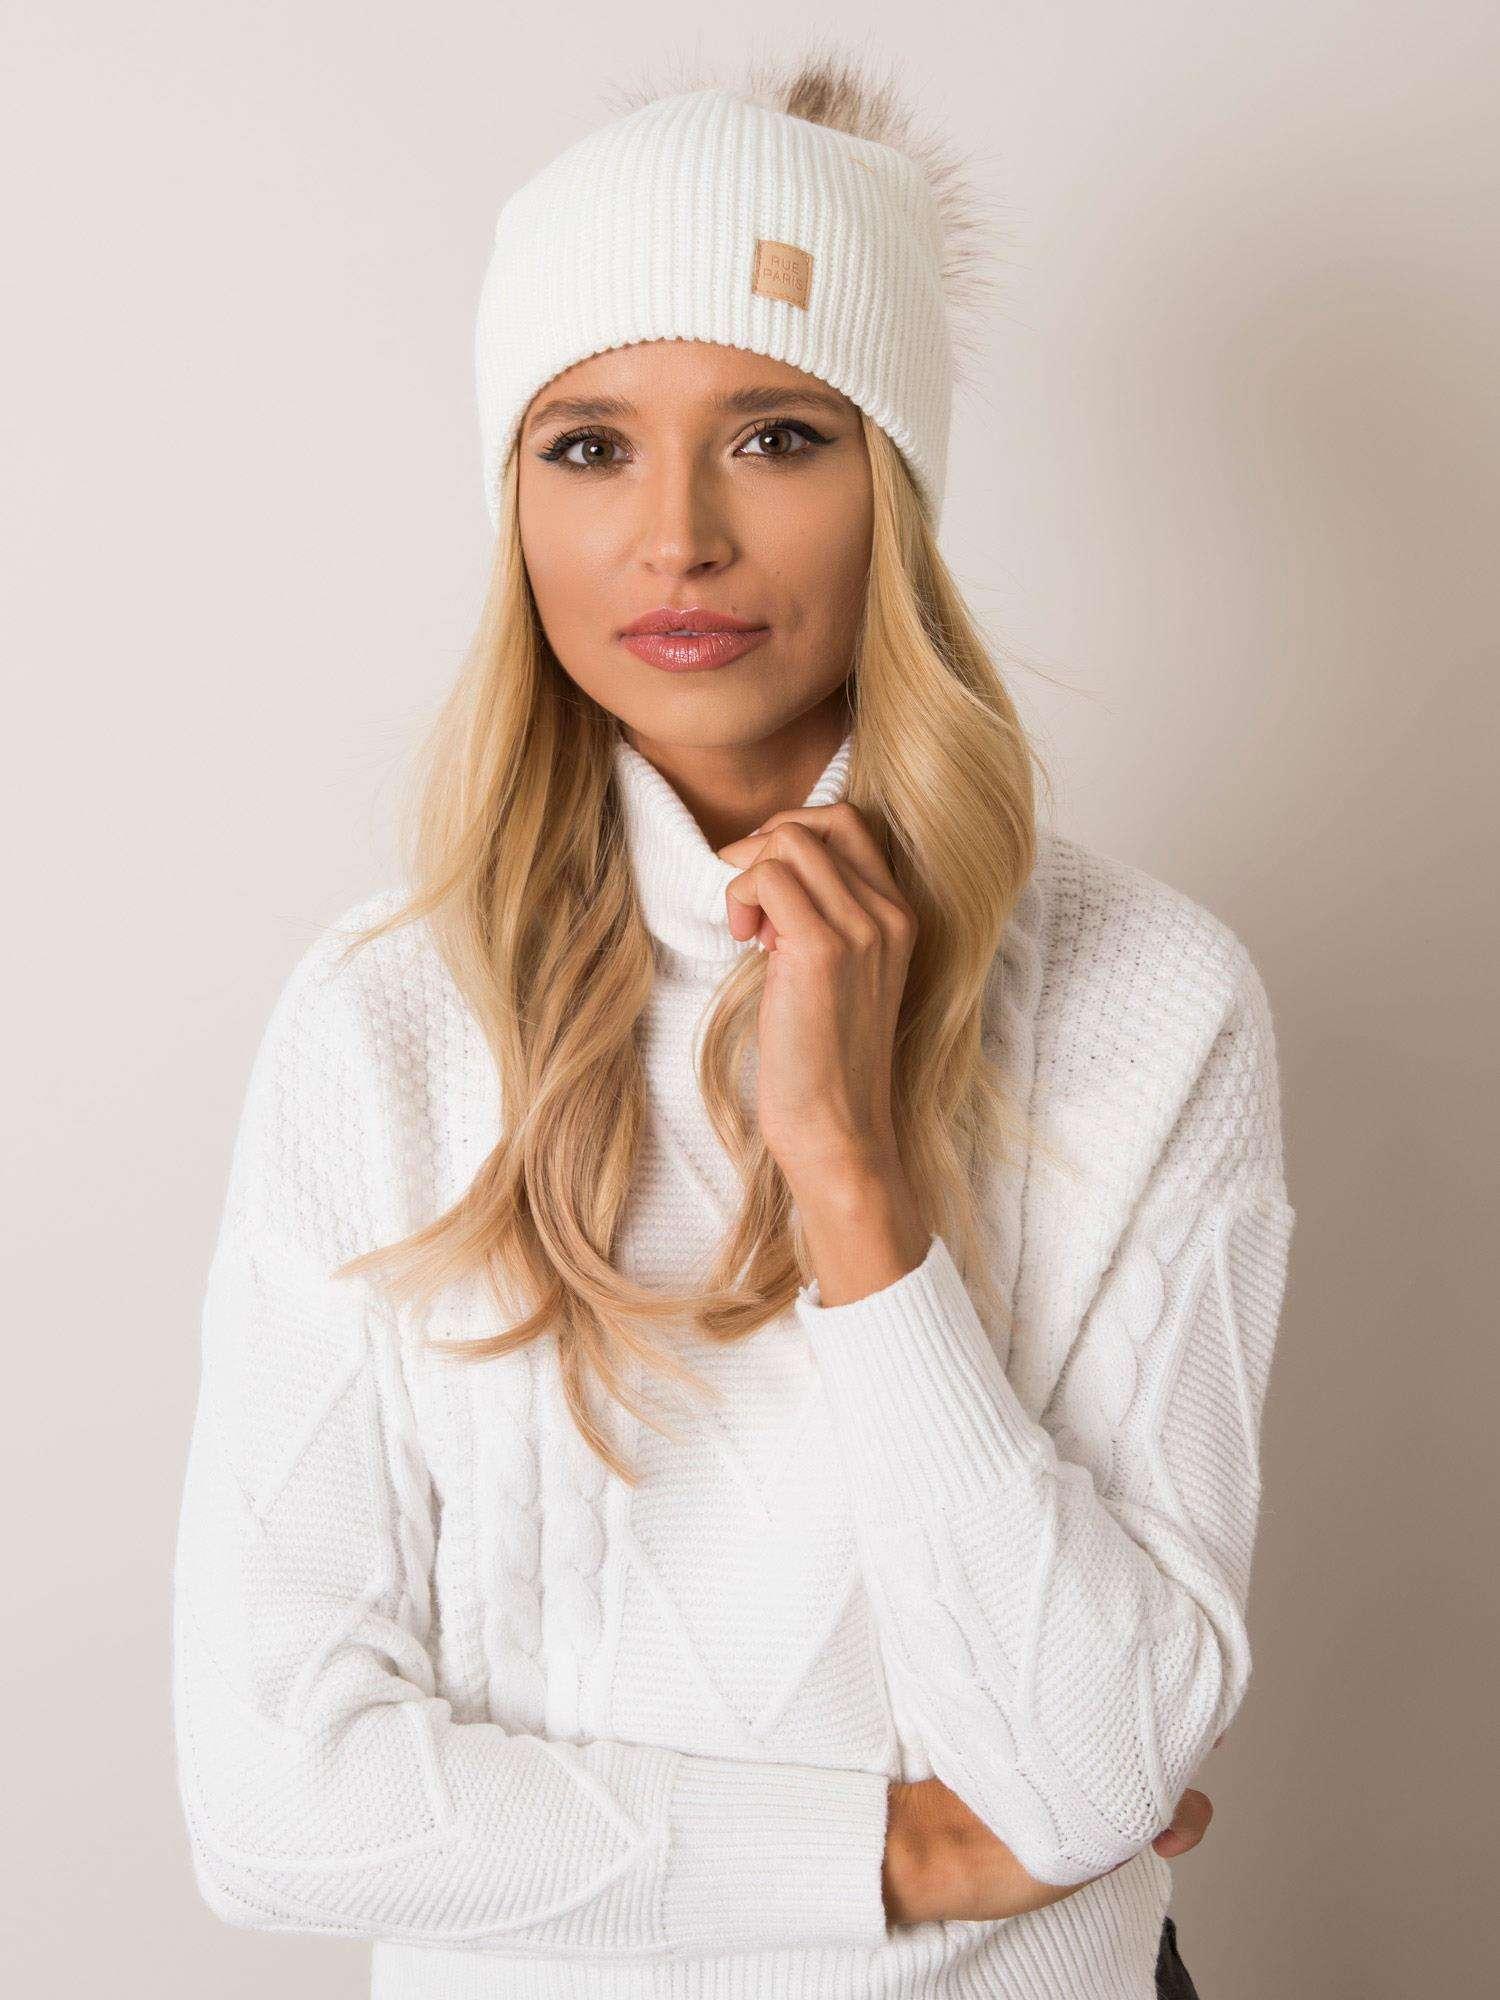 Dámska béžová čiapka s brmbolcom - UNI